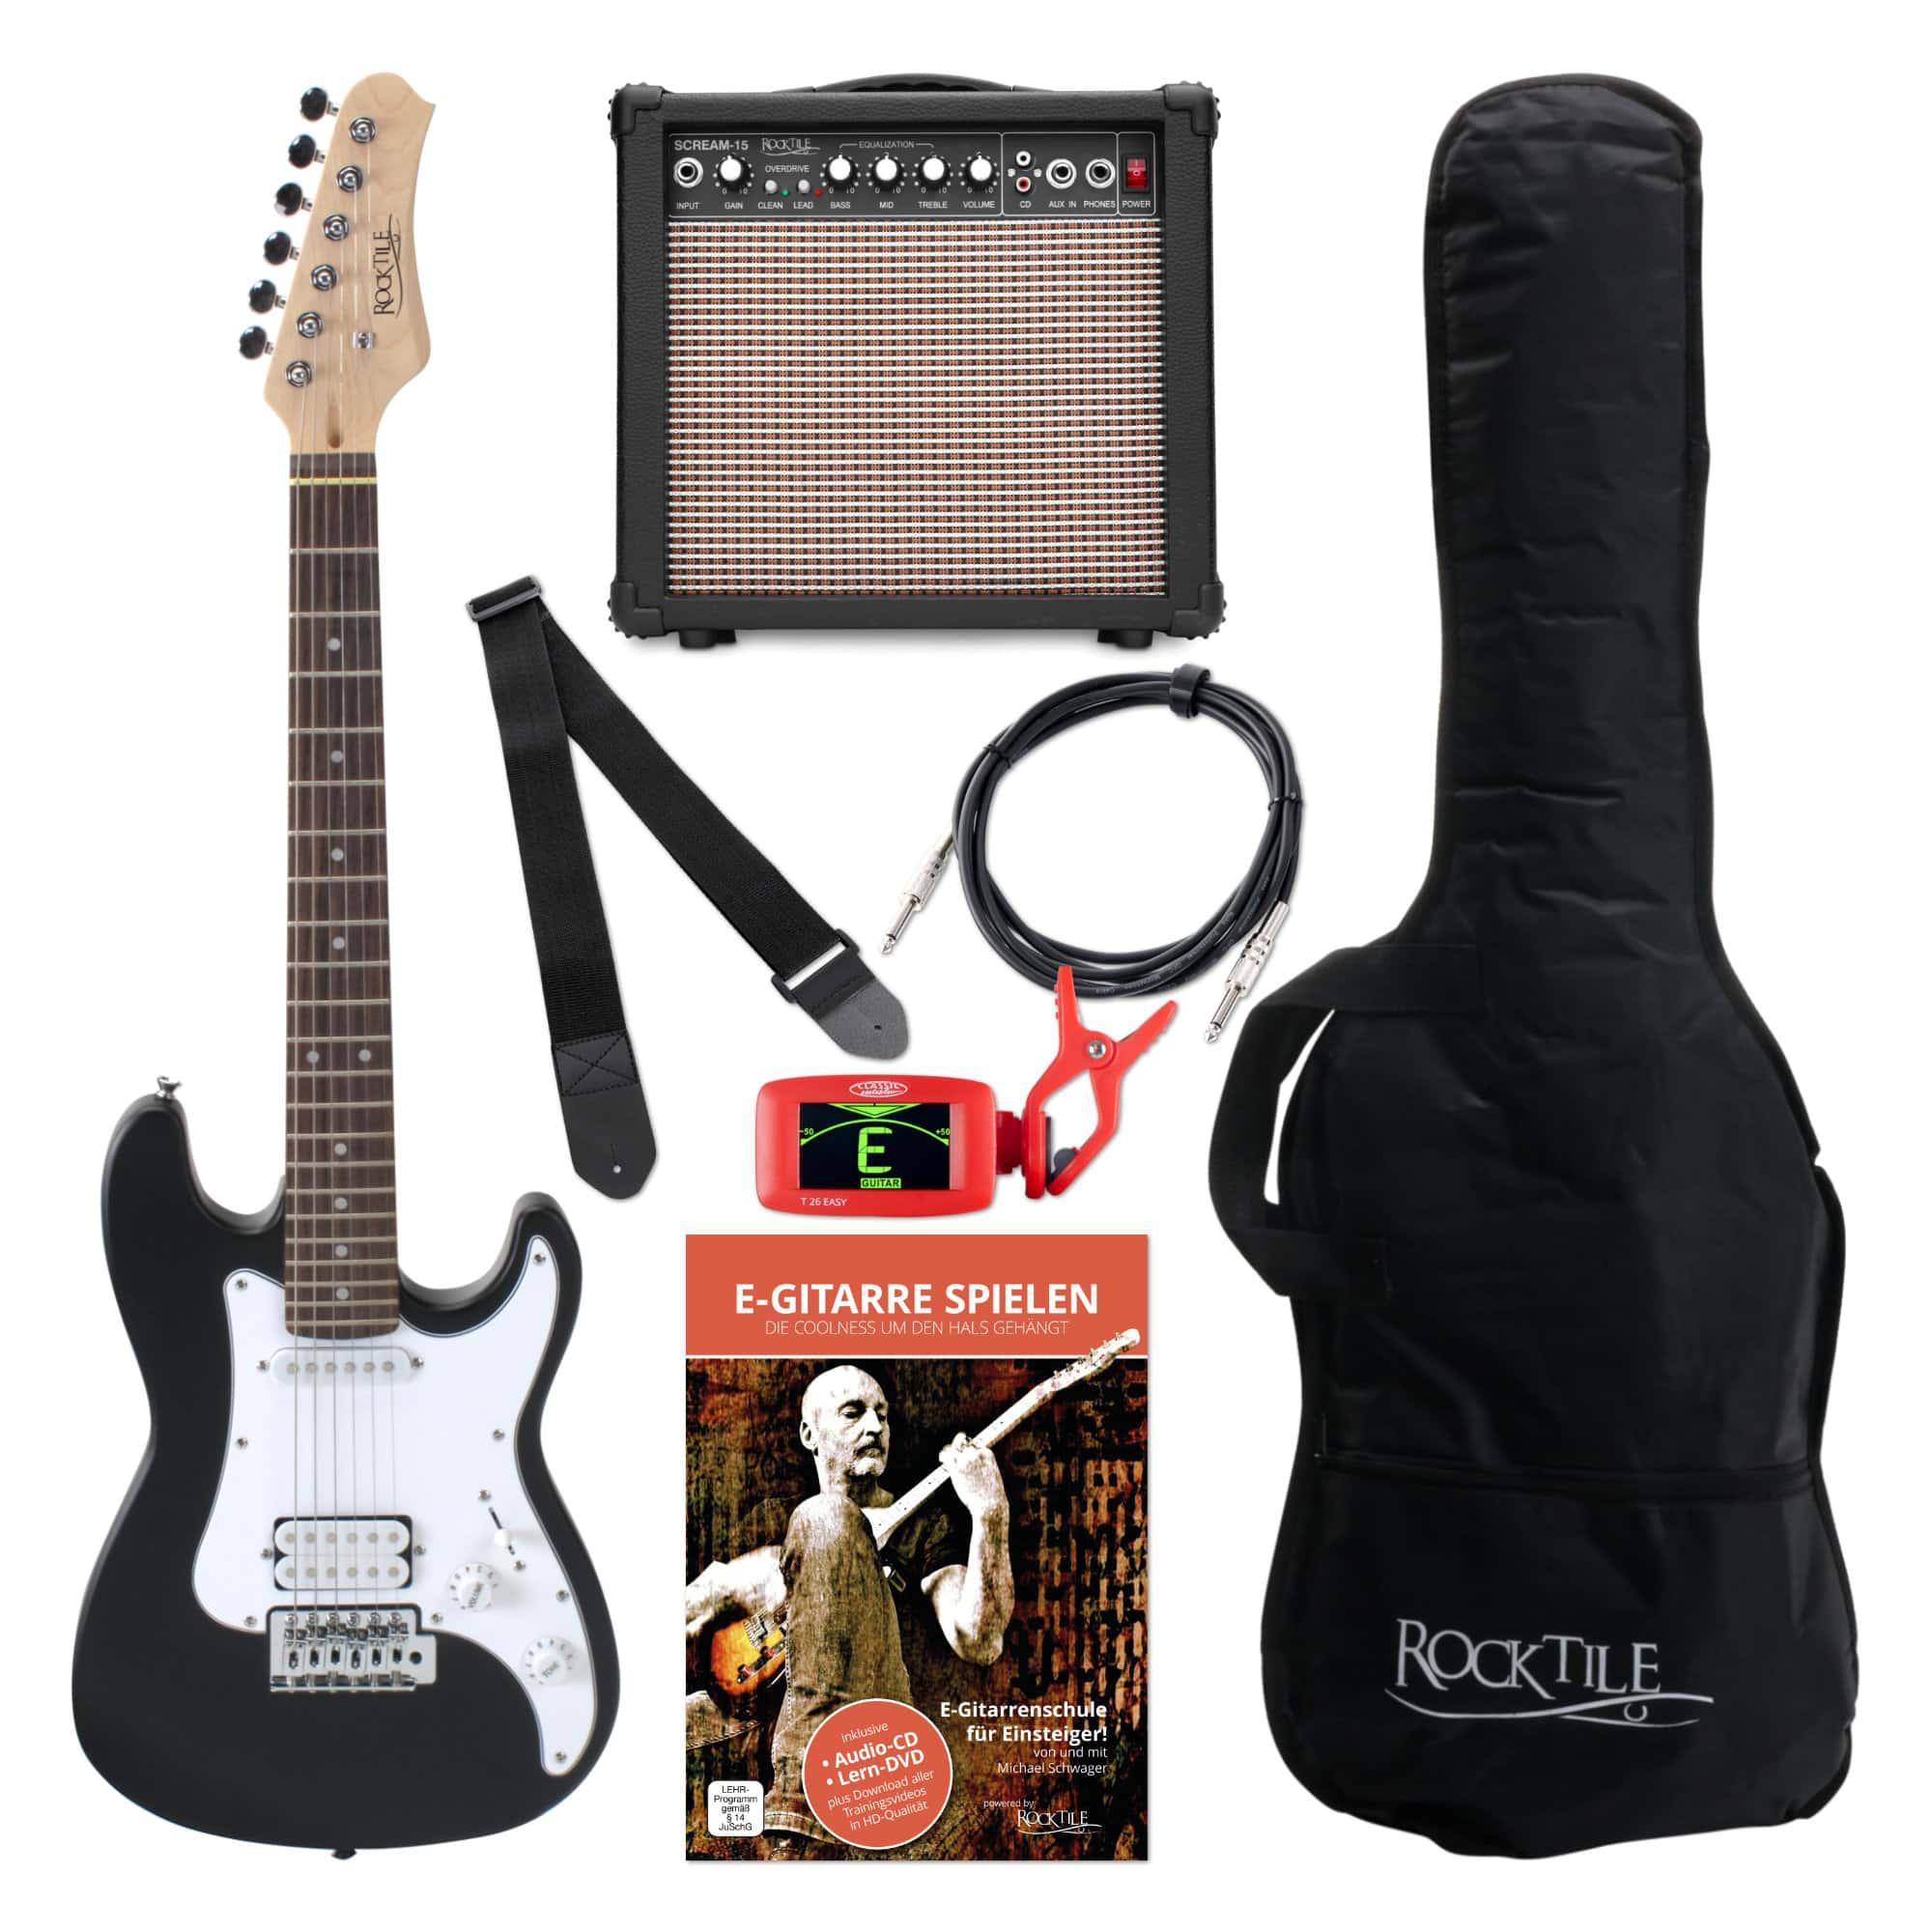 Rocktile Sphere Junior E Gitarre 3|4 Schwarz SET inkl. Verstärker, Kabel und Gurt